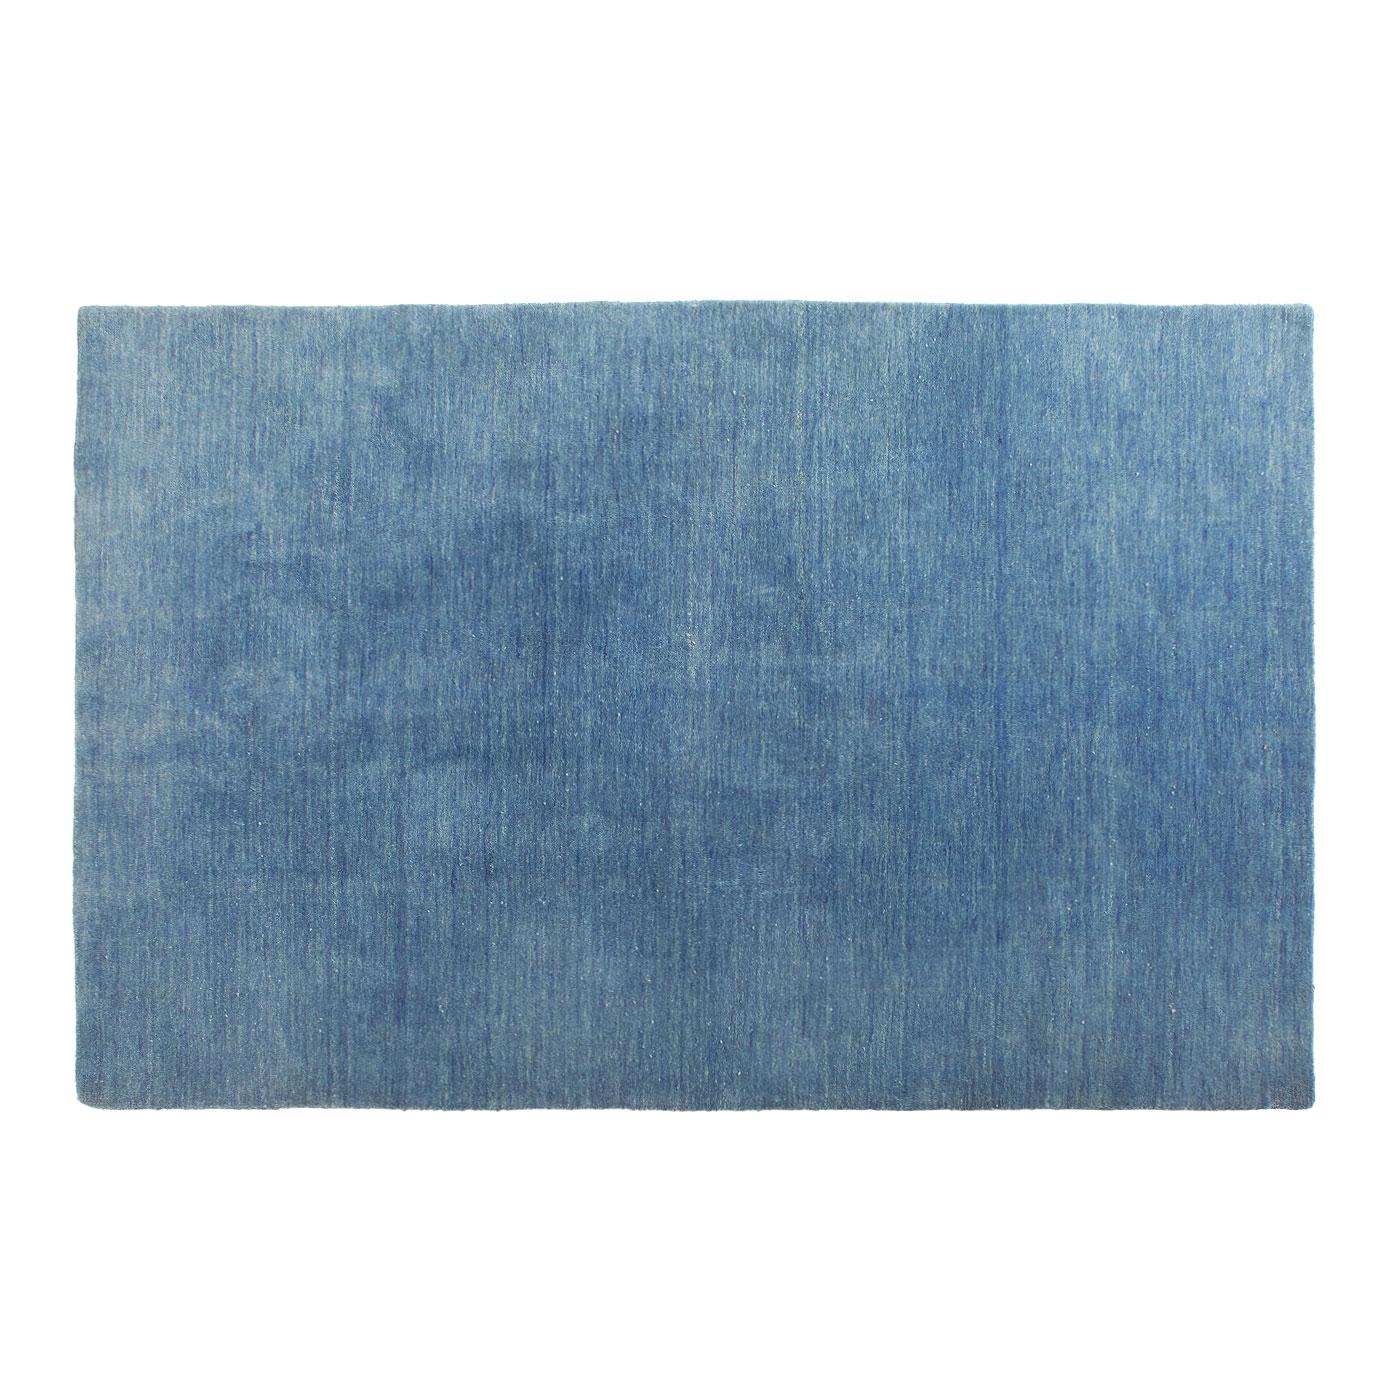 blue rug hotel 8u0027x 10u0027 rug UCOHRCX